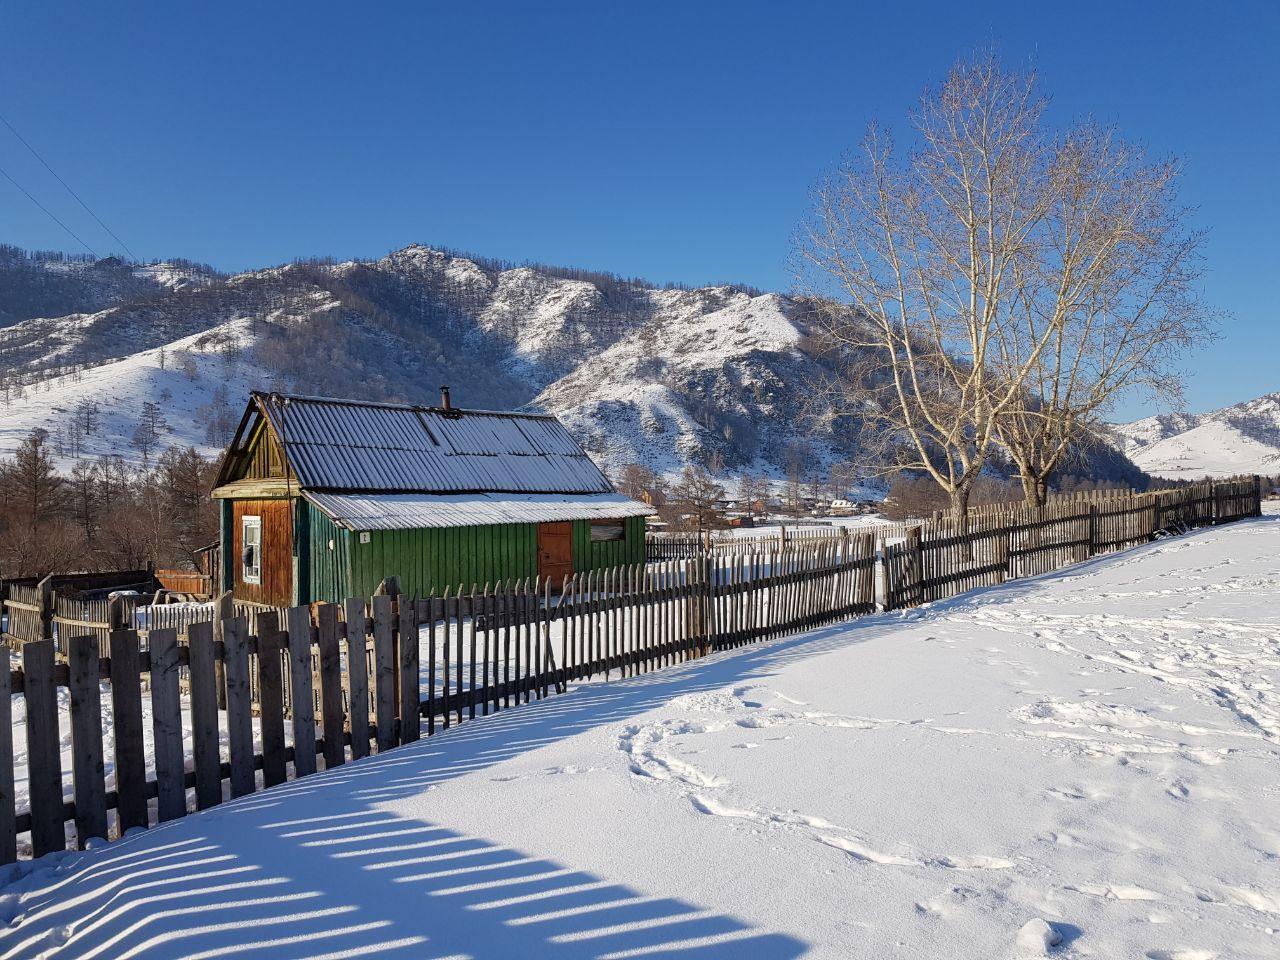 Продажа домика в горах | фото 1 из 1